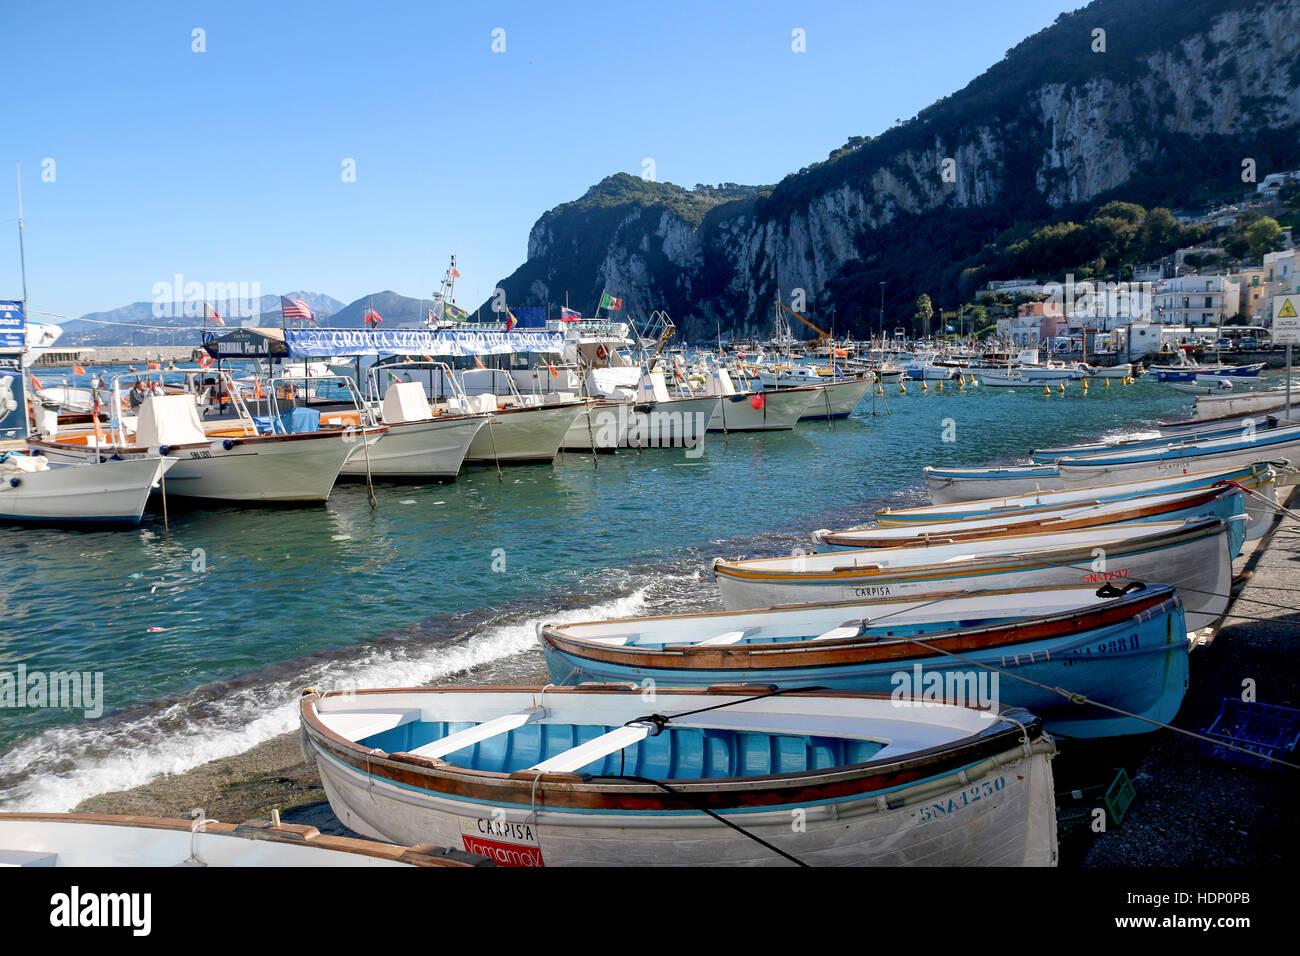 Marina Grande Amalfi Stock Photos  Marina Grande Amalfi Stock Images  Alamy